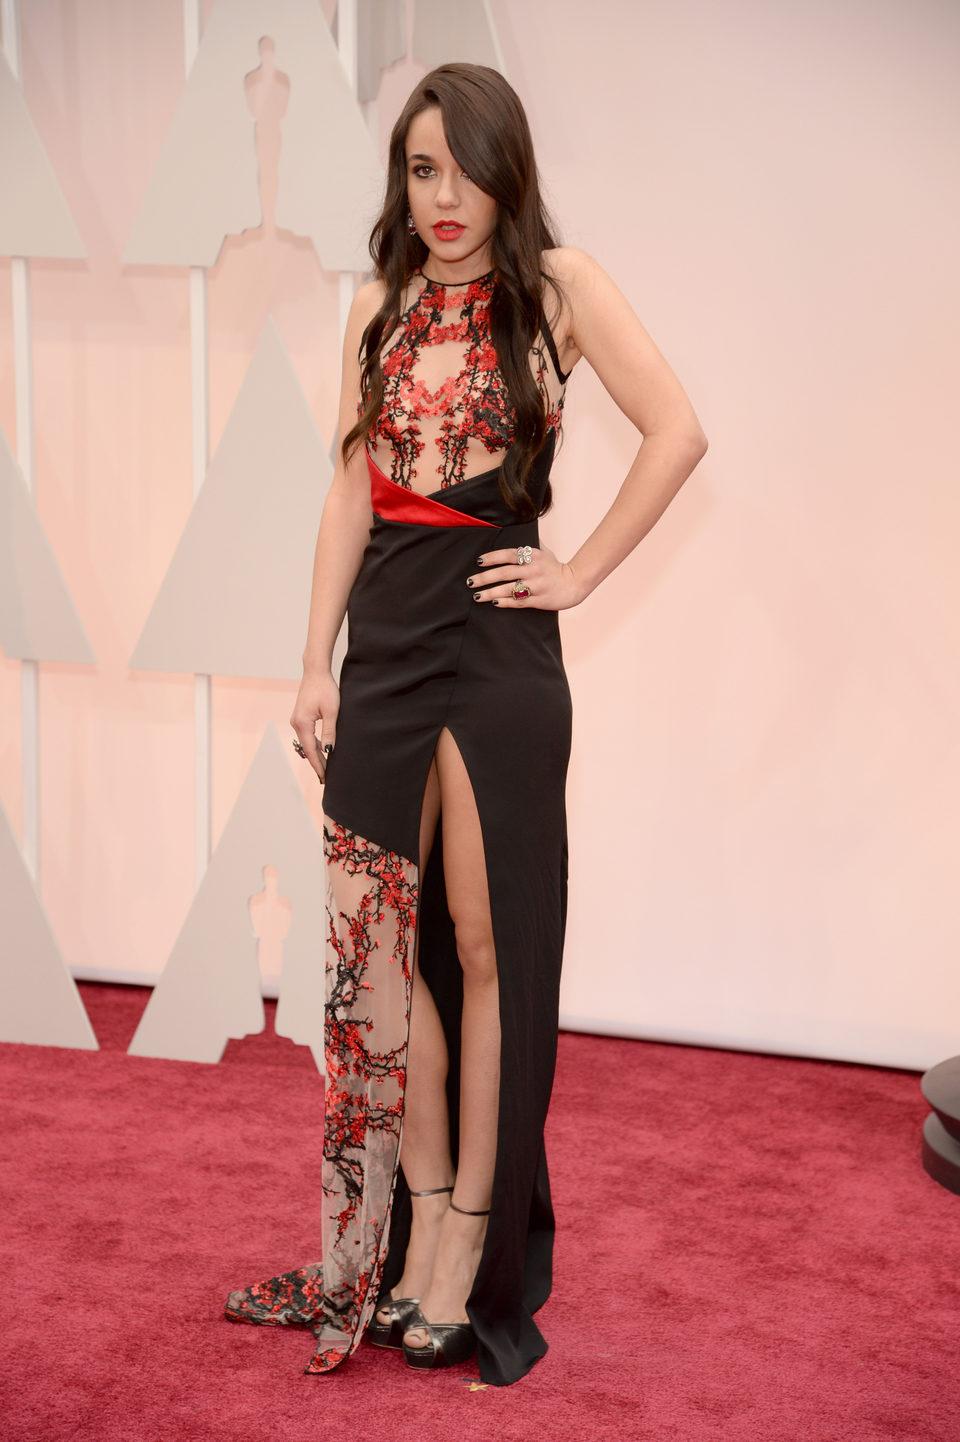 Lorelei Linklater at the Oscar 2015 red carpet